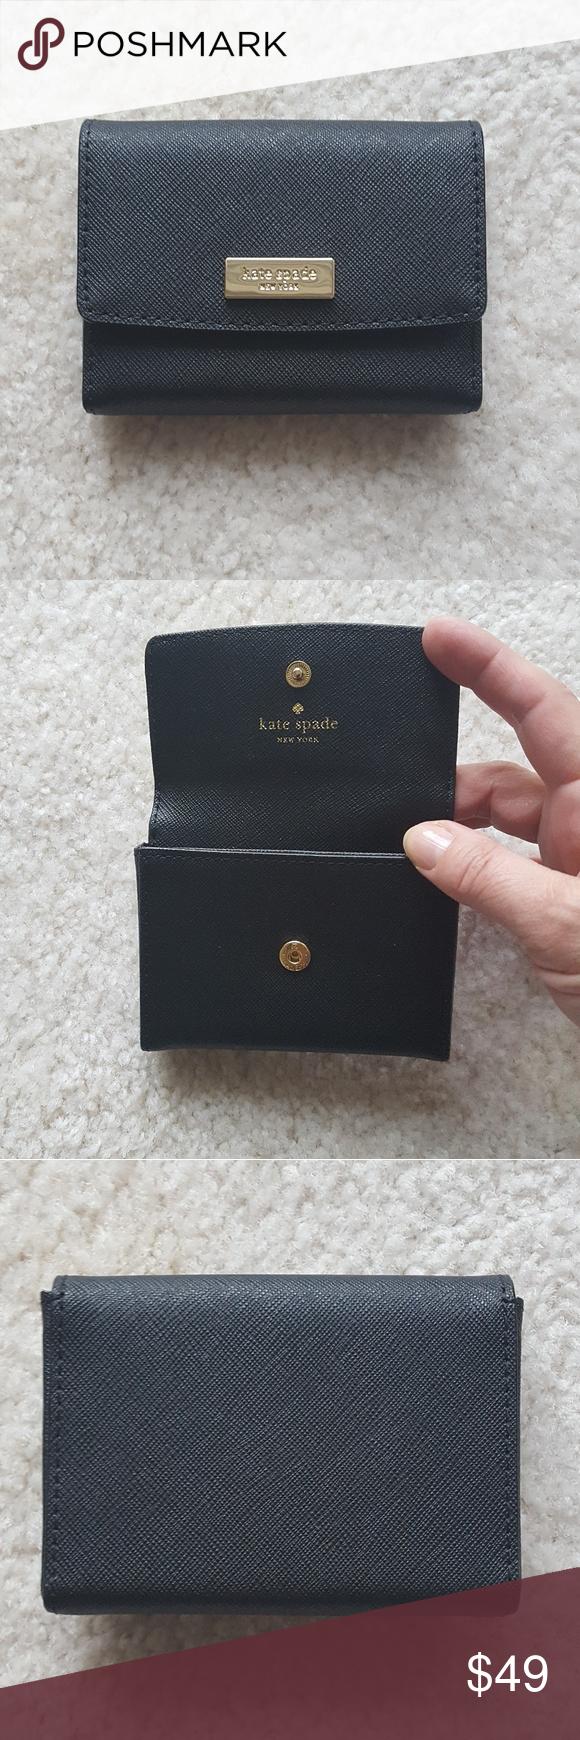 Kate Spade Business Card Credit Card Holder Shopping Card Fashion Tips Fashion Design